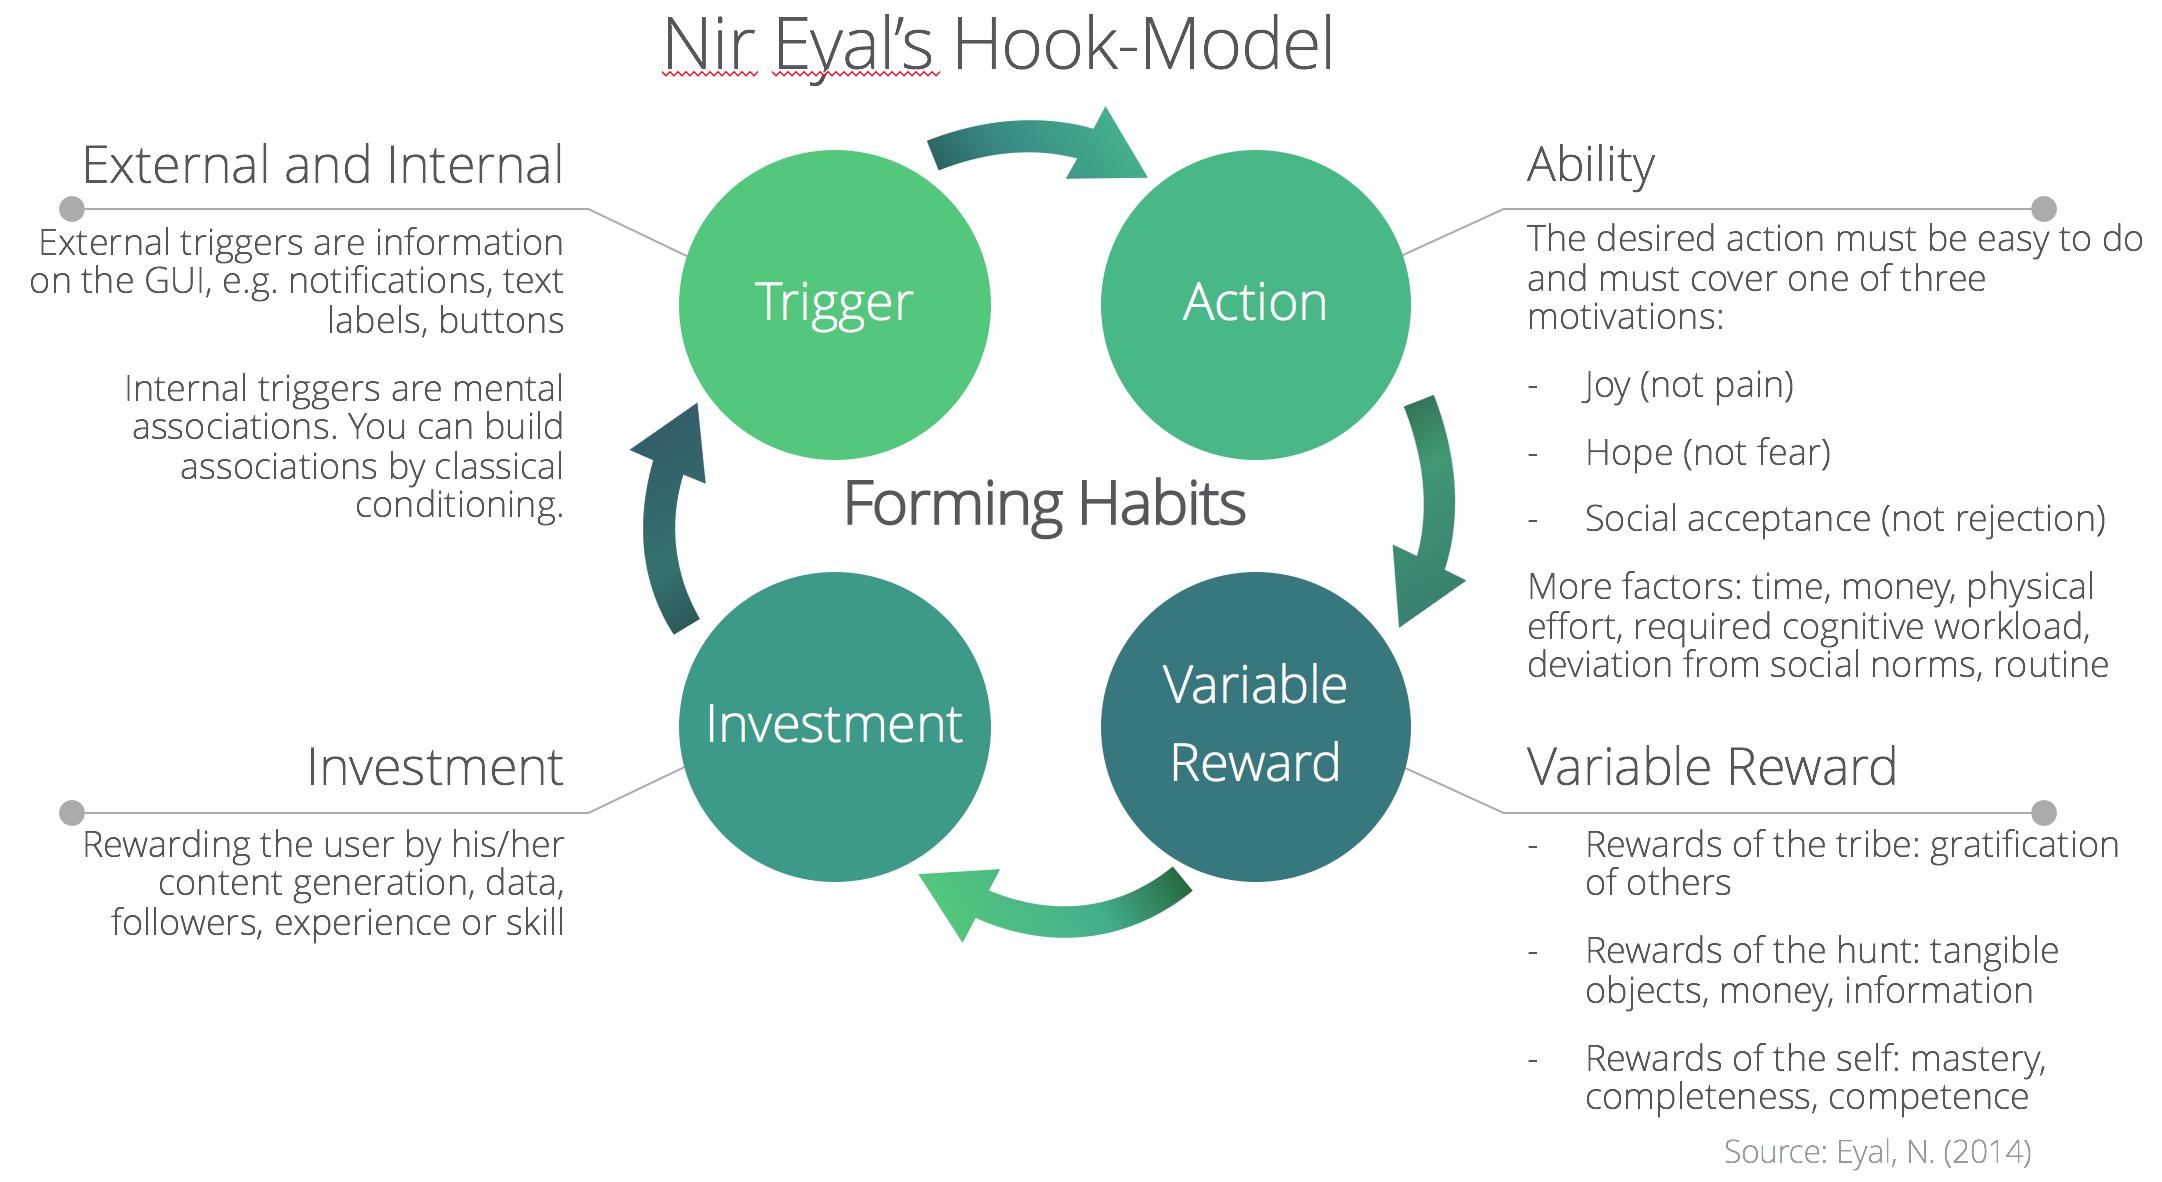 Nir Eyals Hook Model